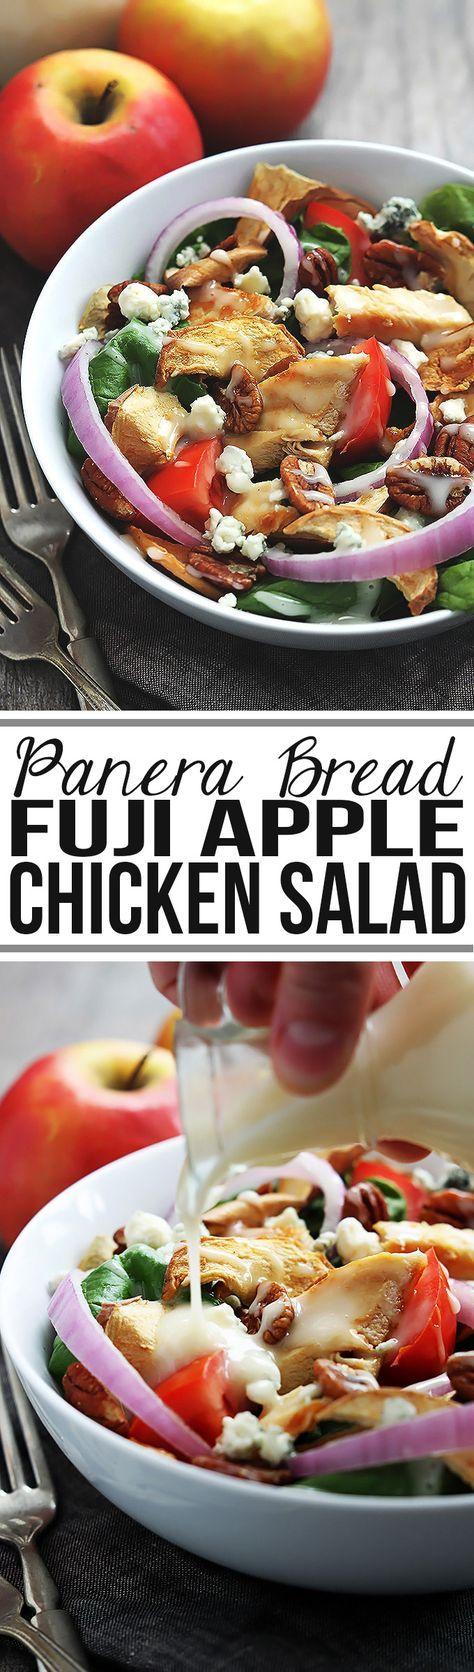 Apple Recipe | Panera Bread's Fuji Apple Chicken Salad